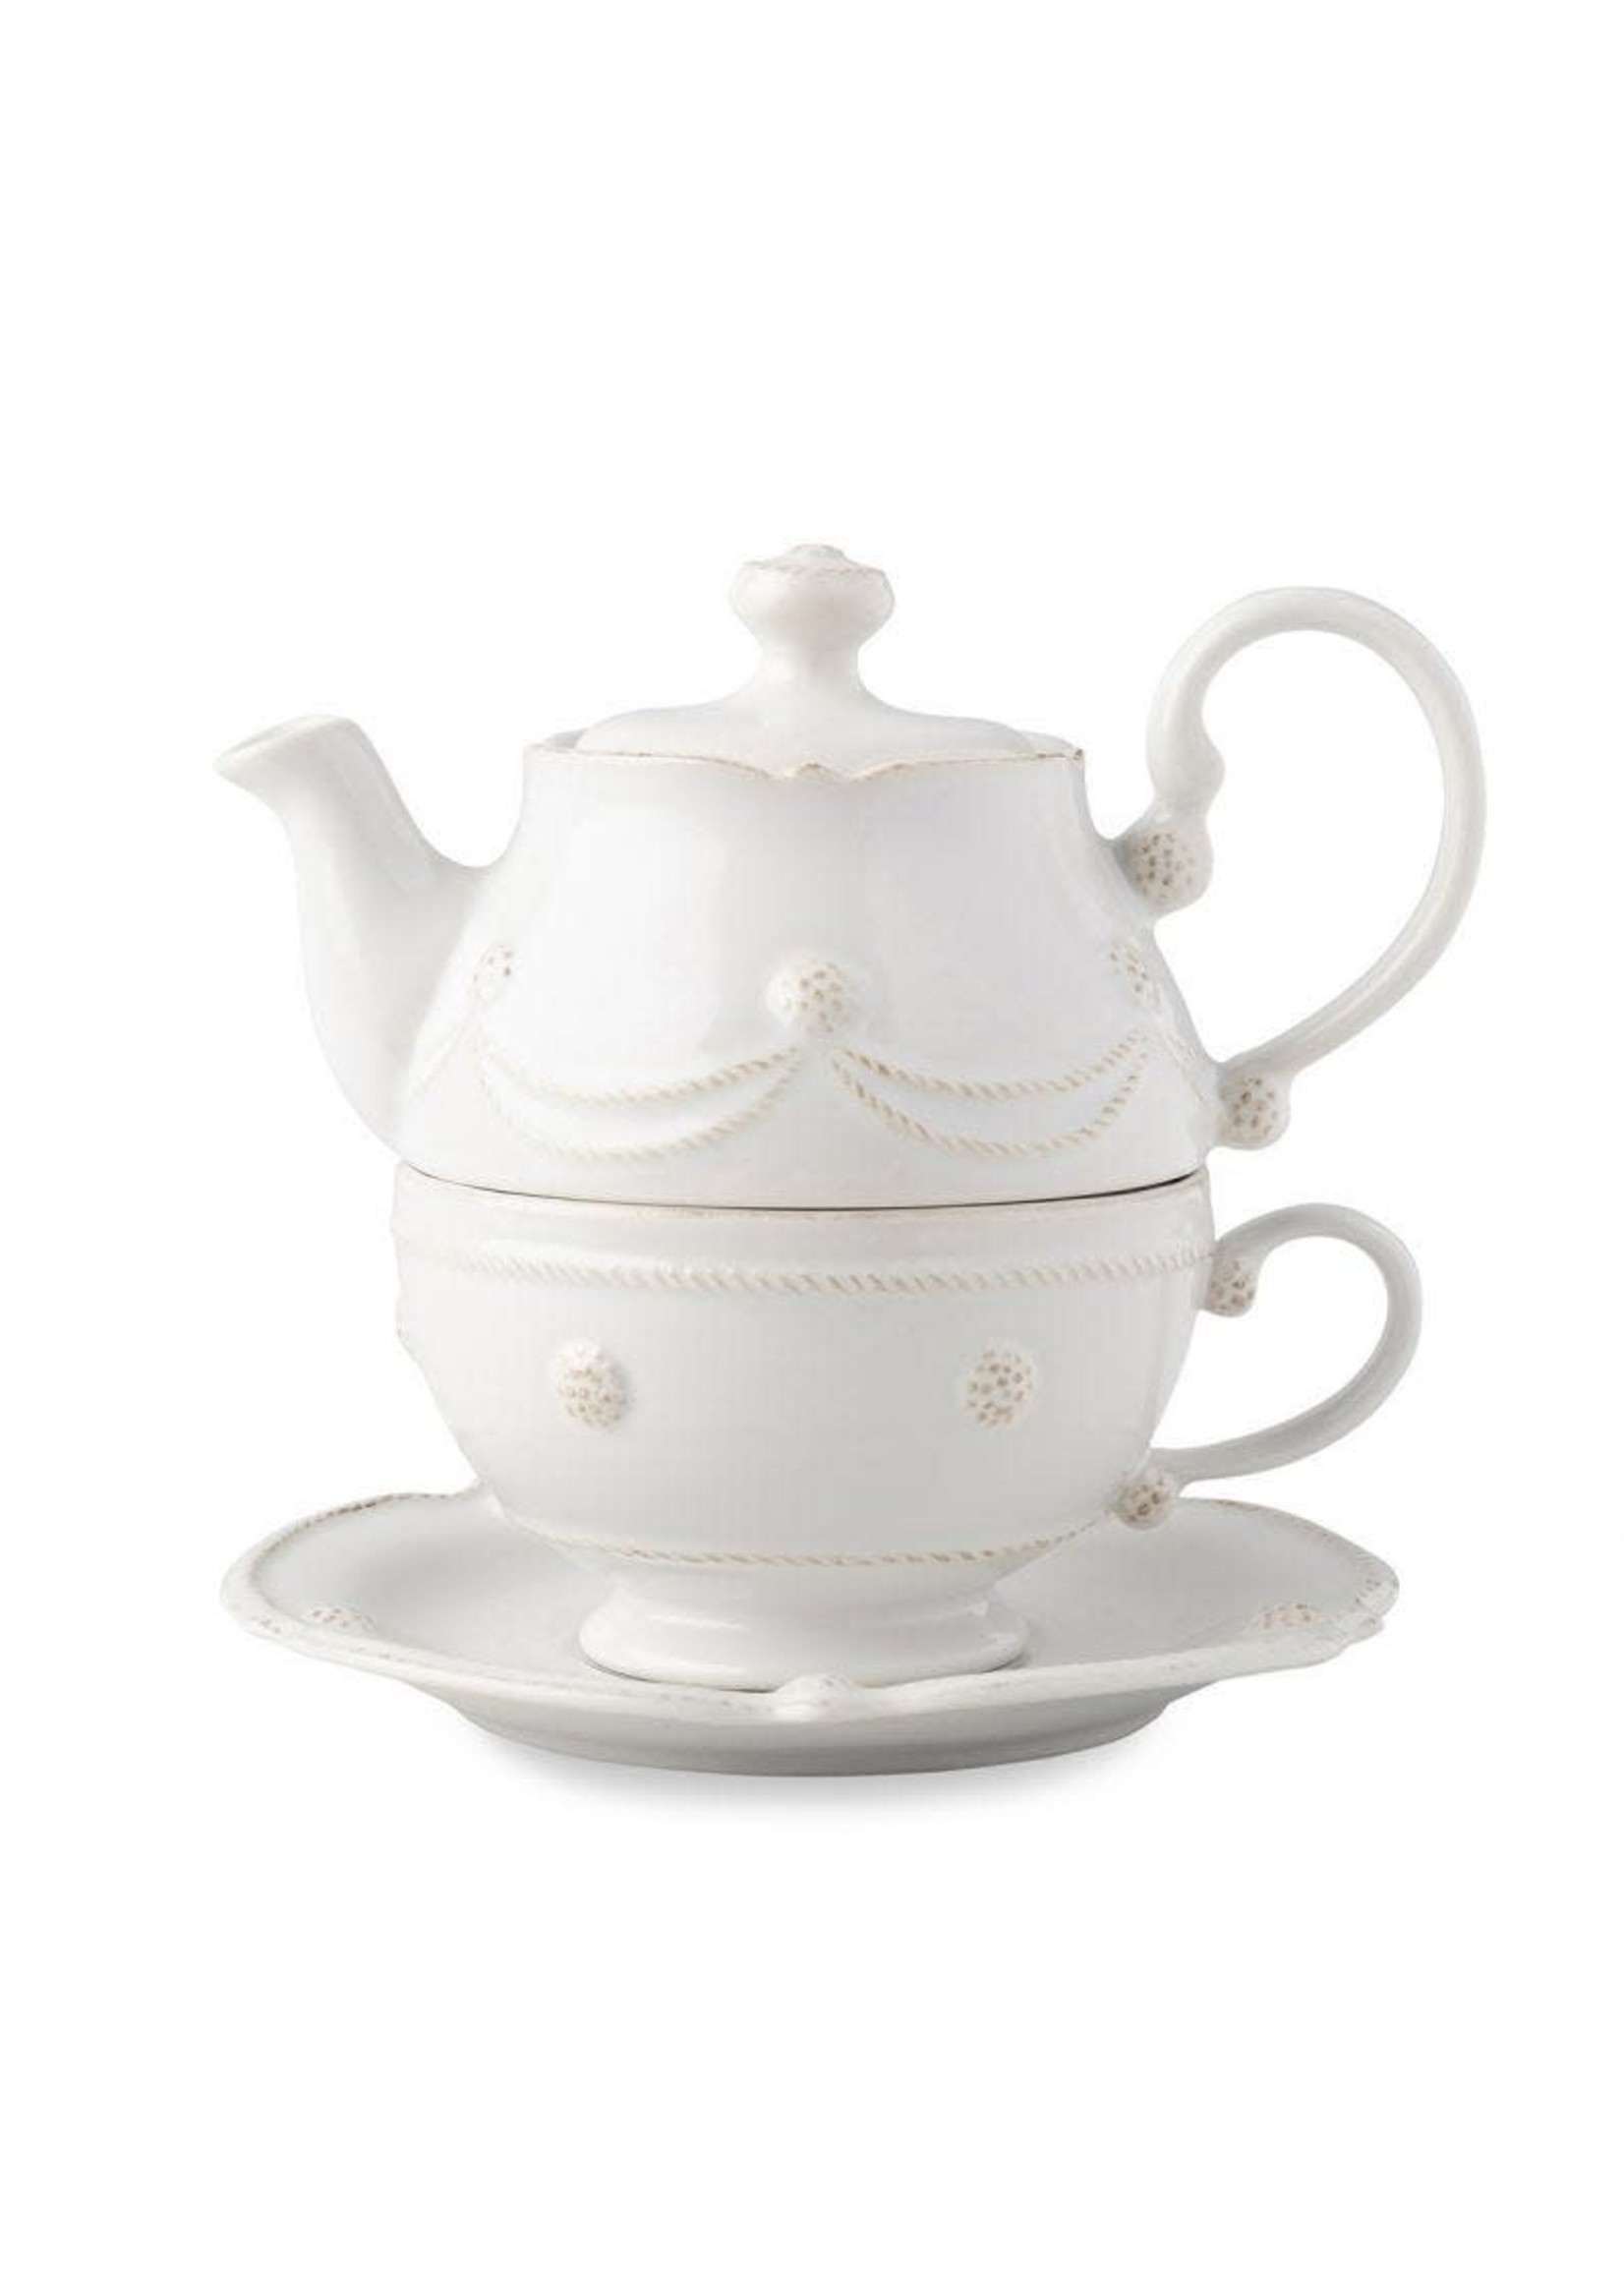 Juliska Berry & Thread Tea for One